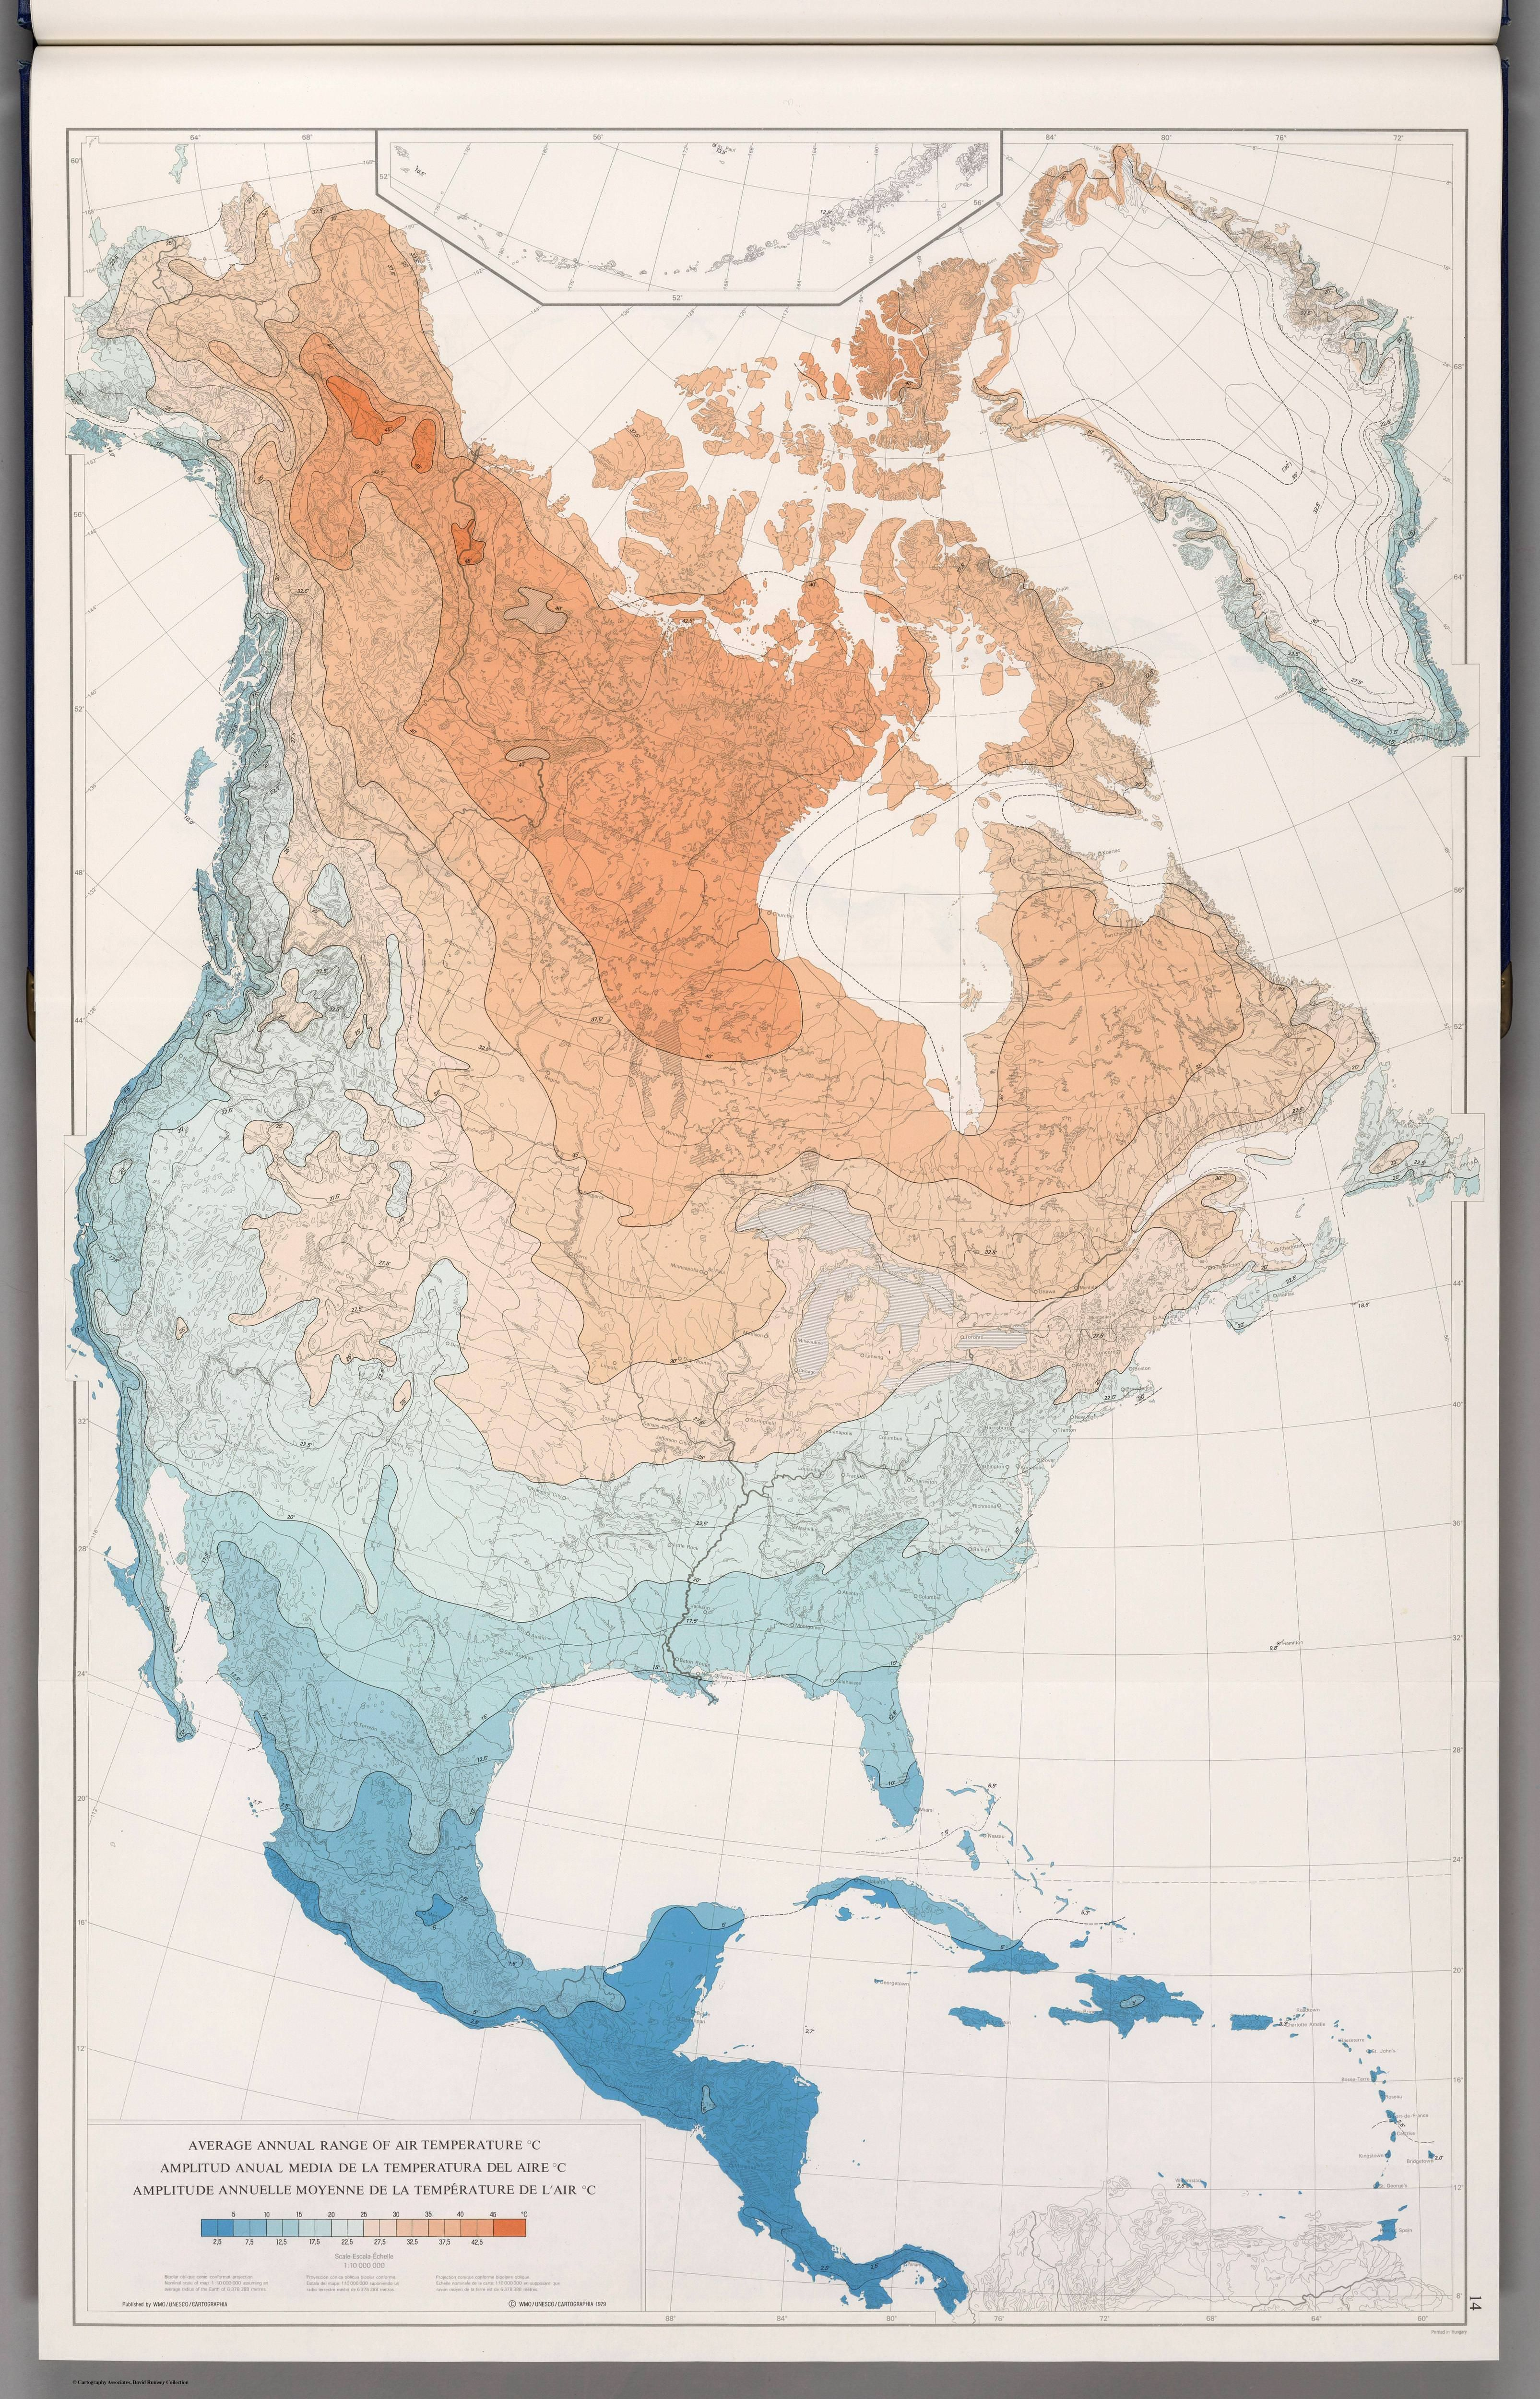 North america average annual range of air temperature c 1979 north america average annual range of air temperature c 1979 gumiabroncs Choice Image